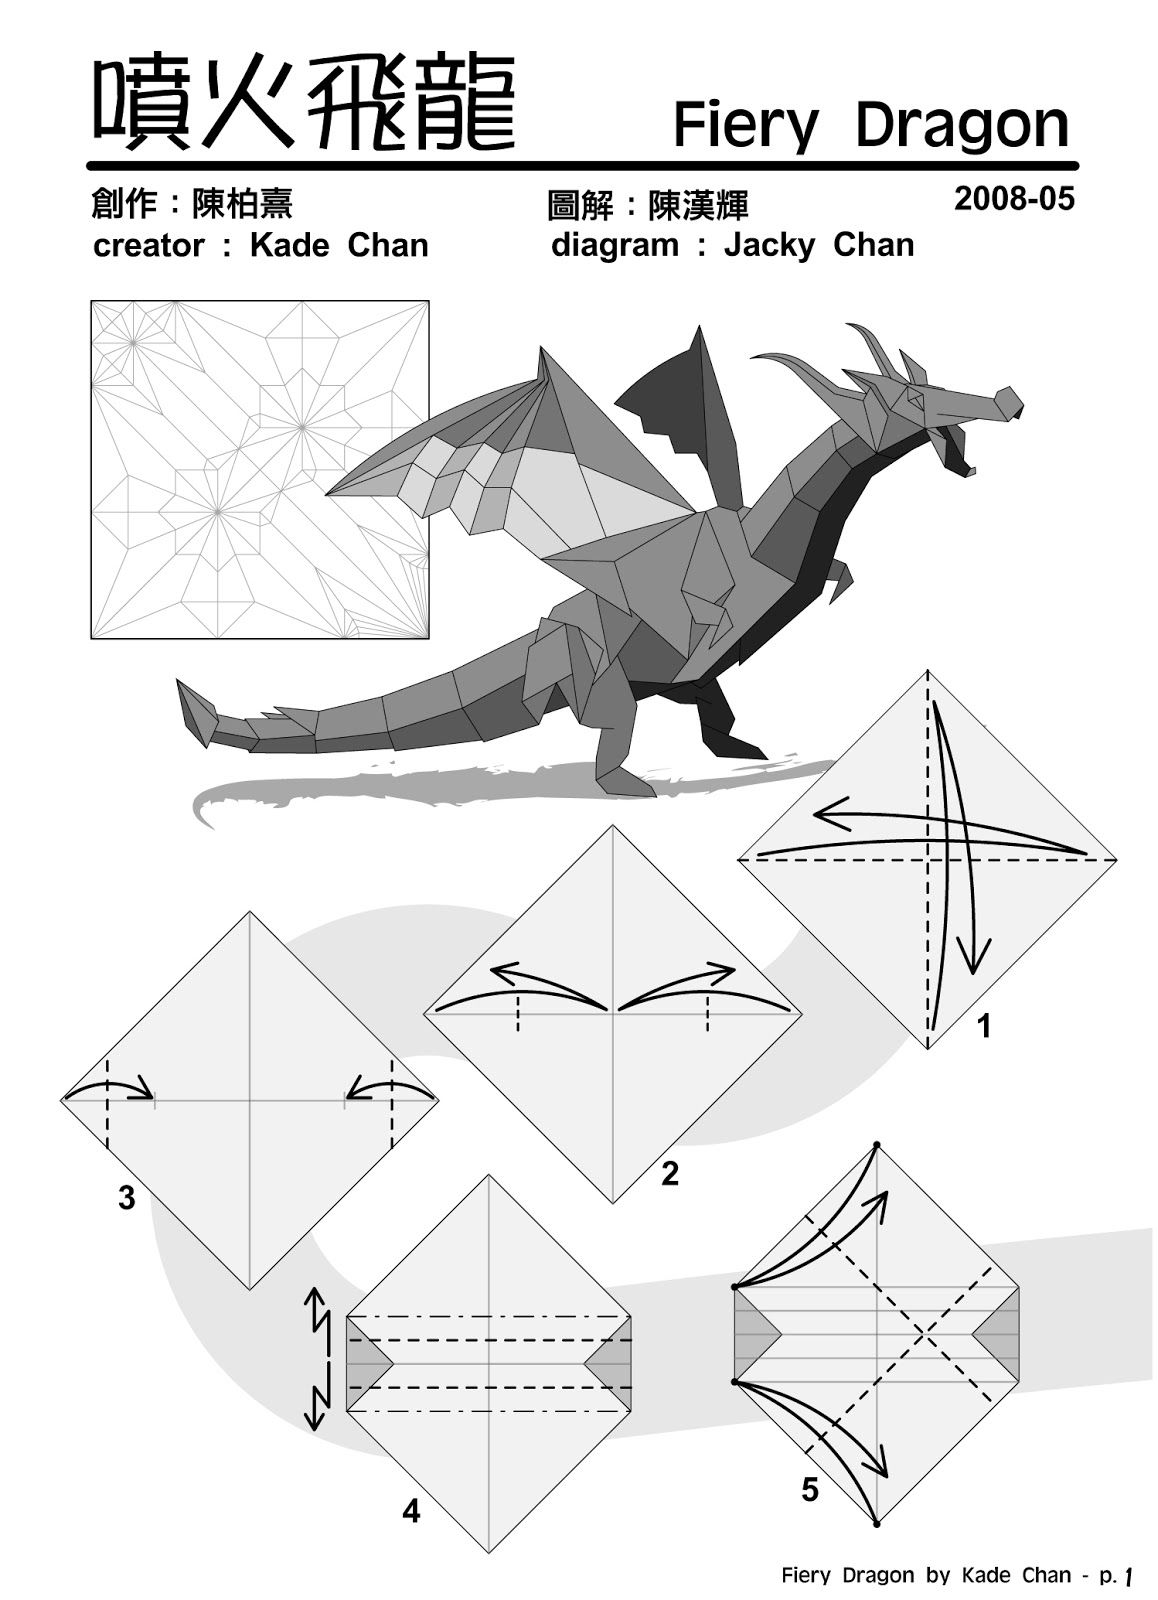 origami wolf instructions diagram bmw e30 radio wiring kade chan blog 香港摺紙工作室 日誌 fiery dragon